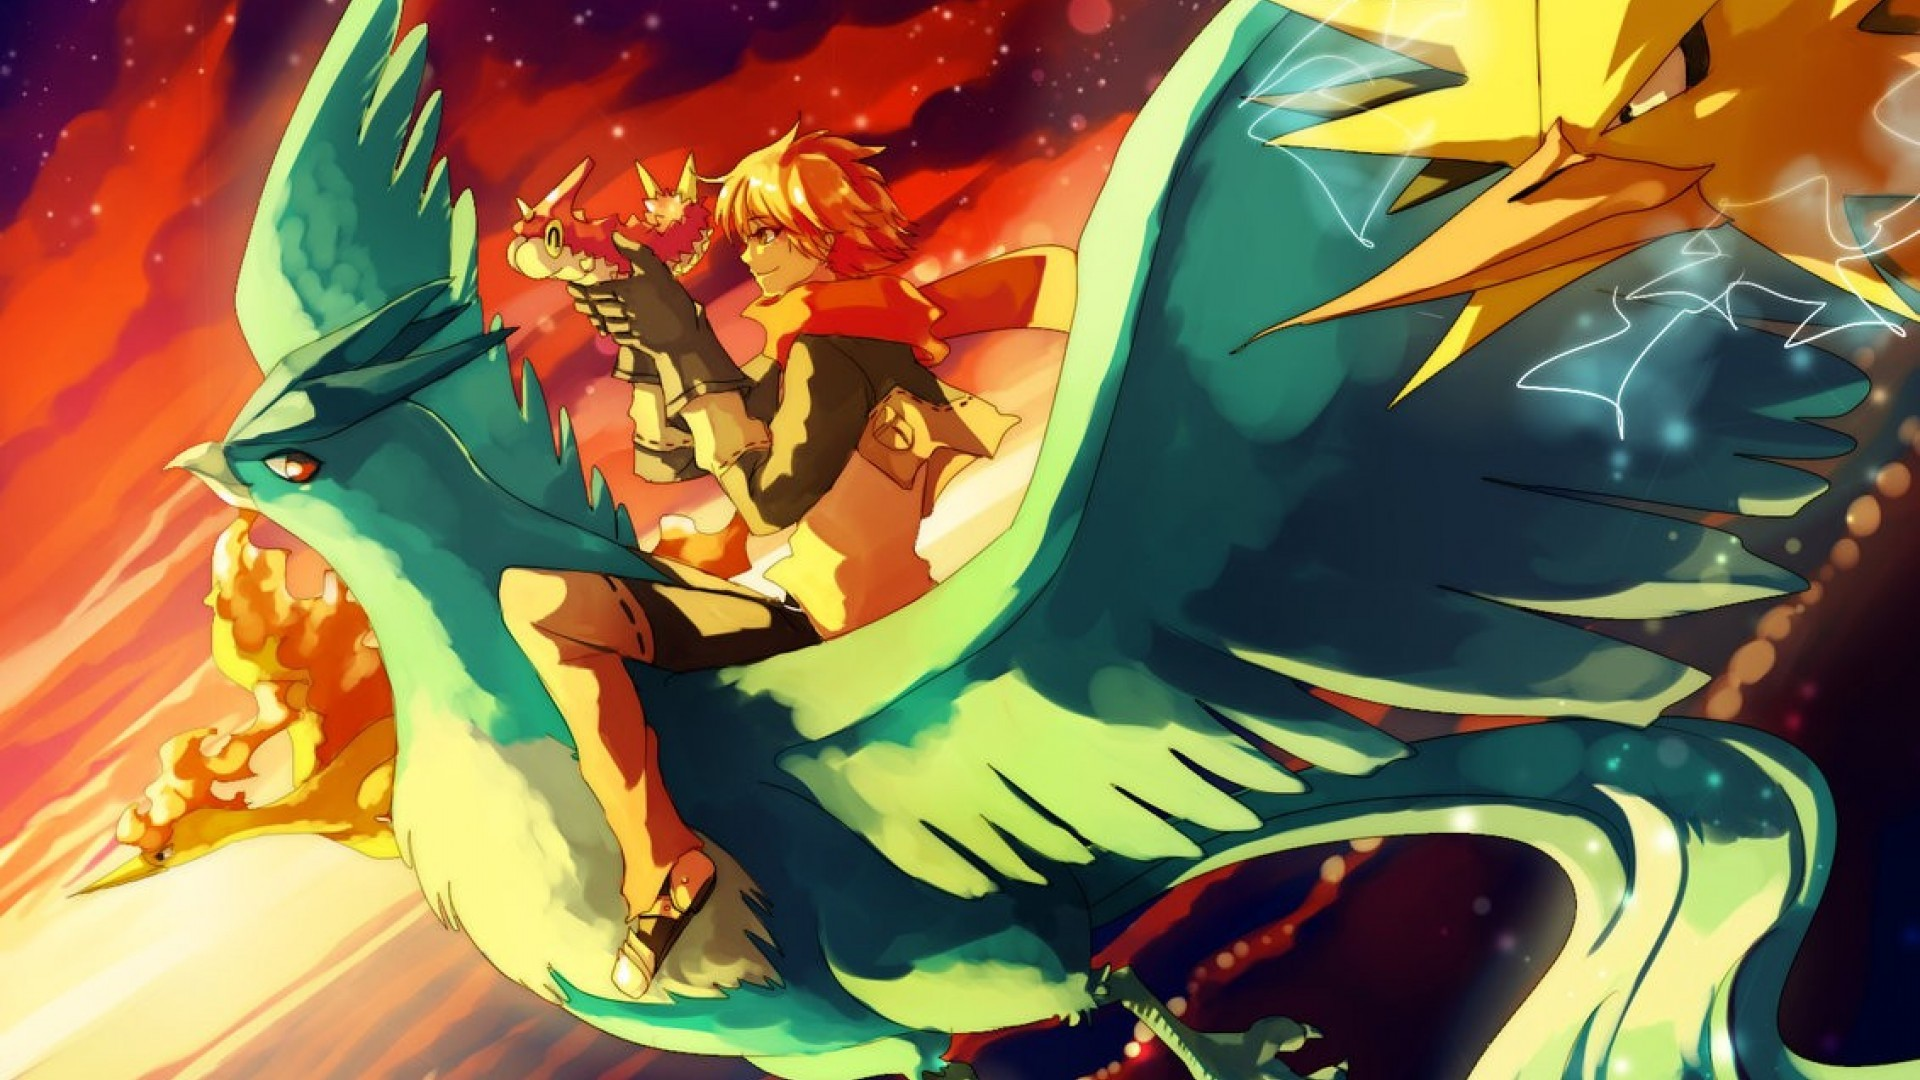 Res: 1920x1080, Pokemon Legendary Birds wallpaper 1421425